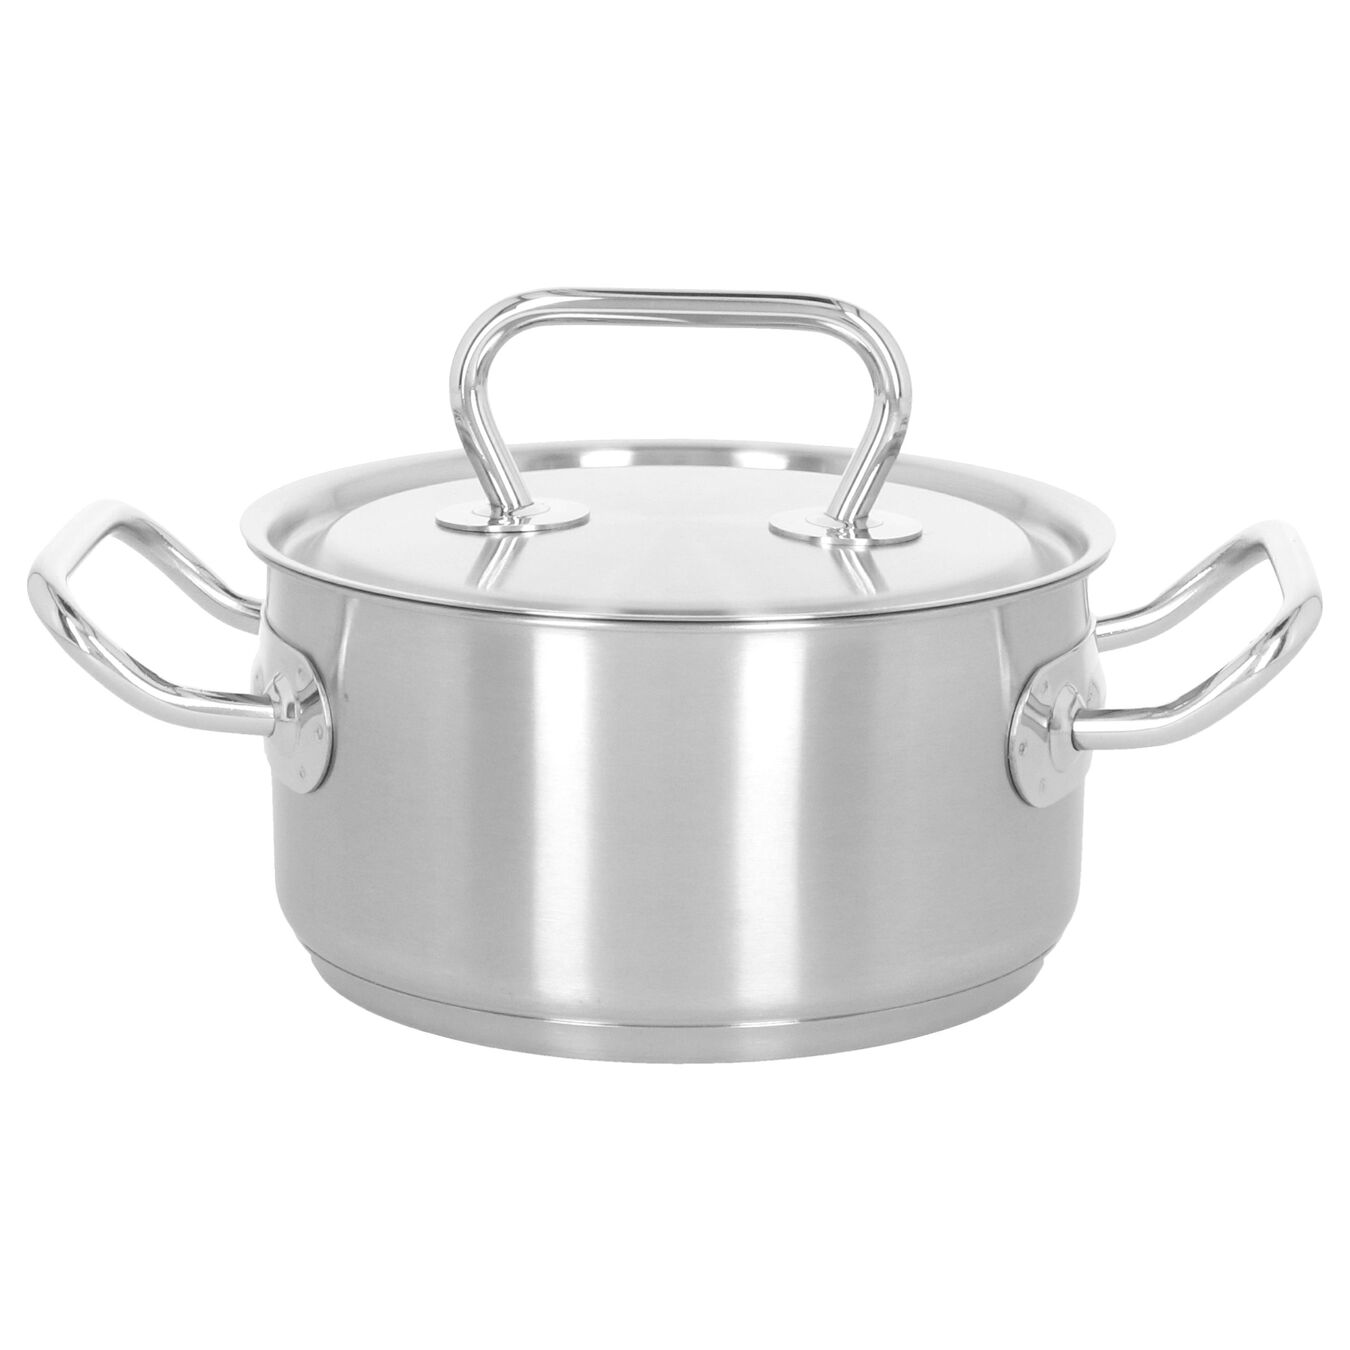 Kookpot met deksel 16 cm / 1,5 l,,large 1